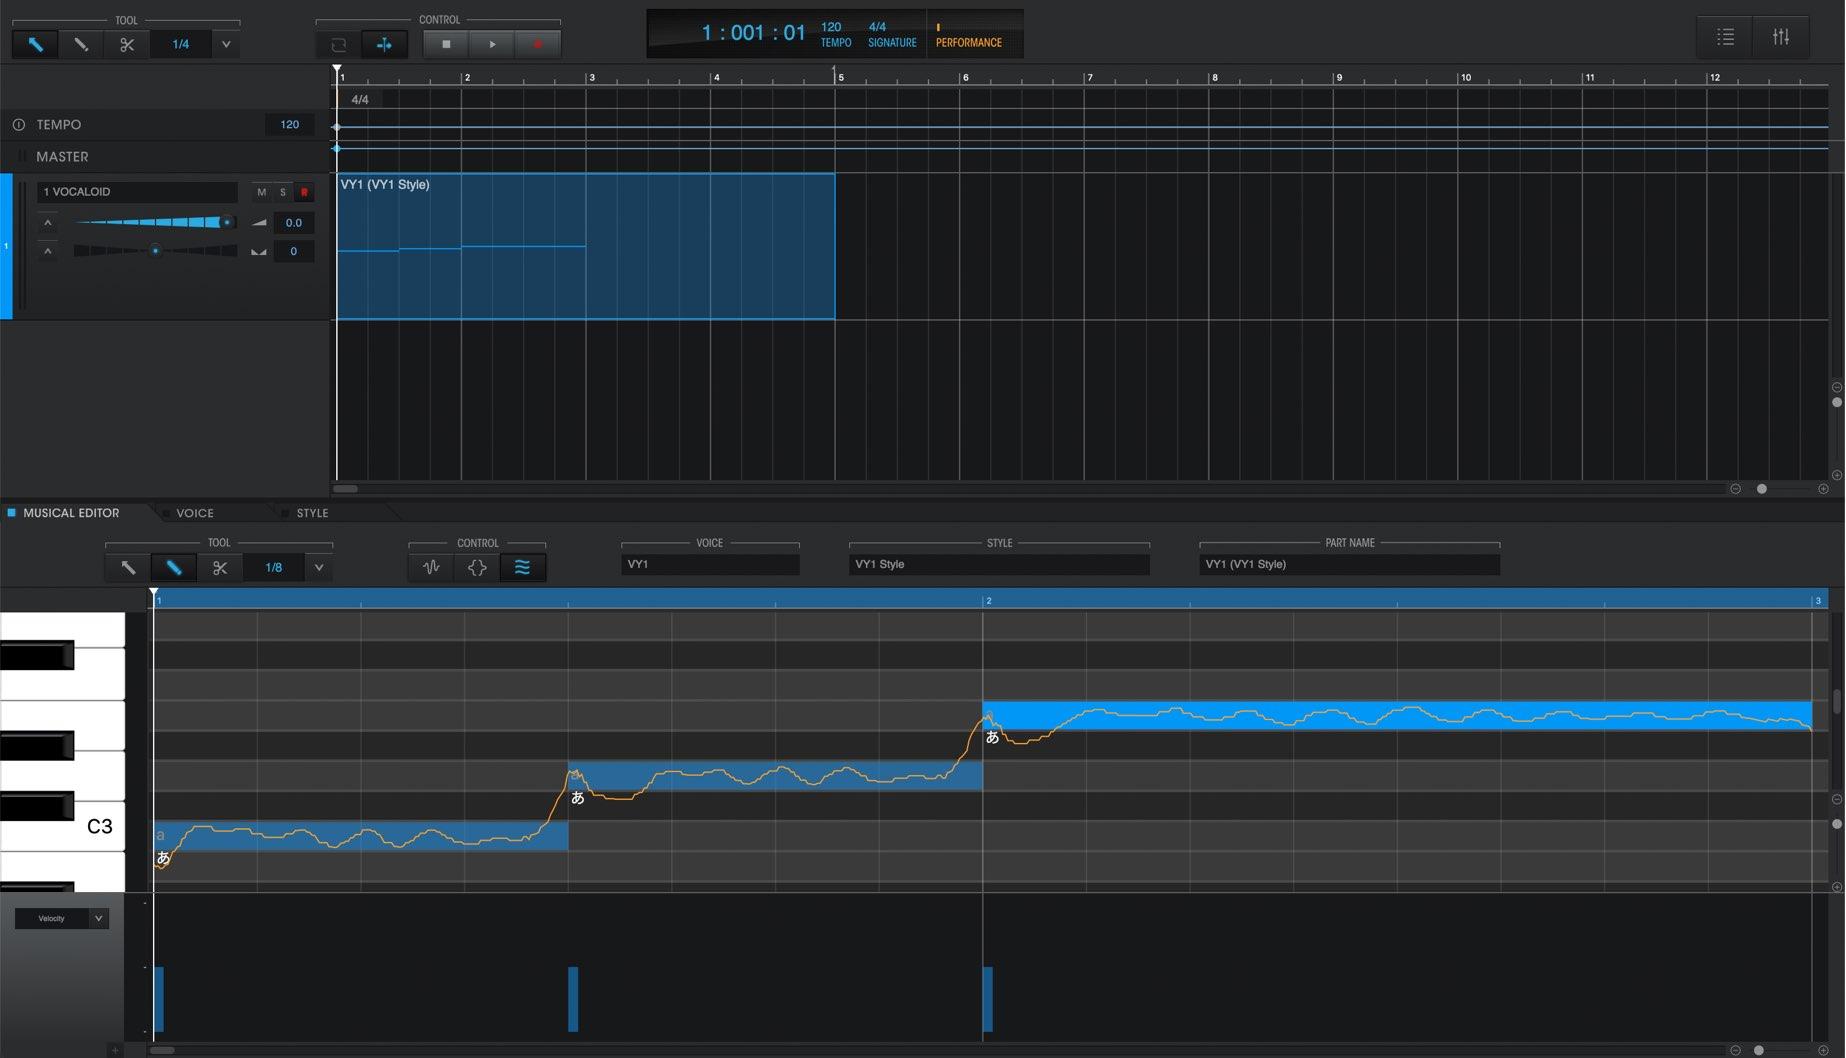 VOCALOID 5 Editor